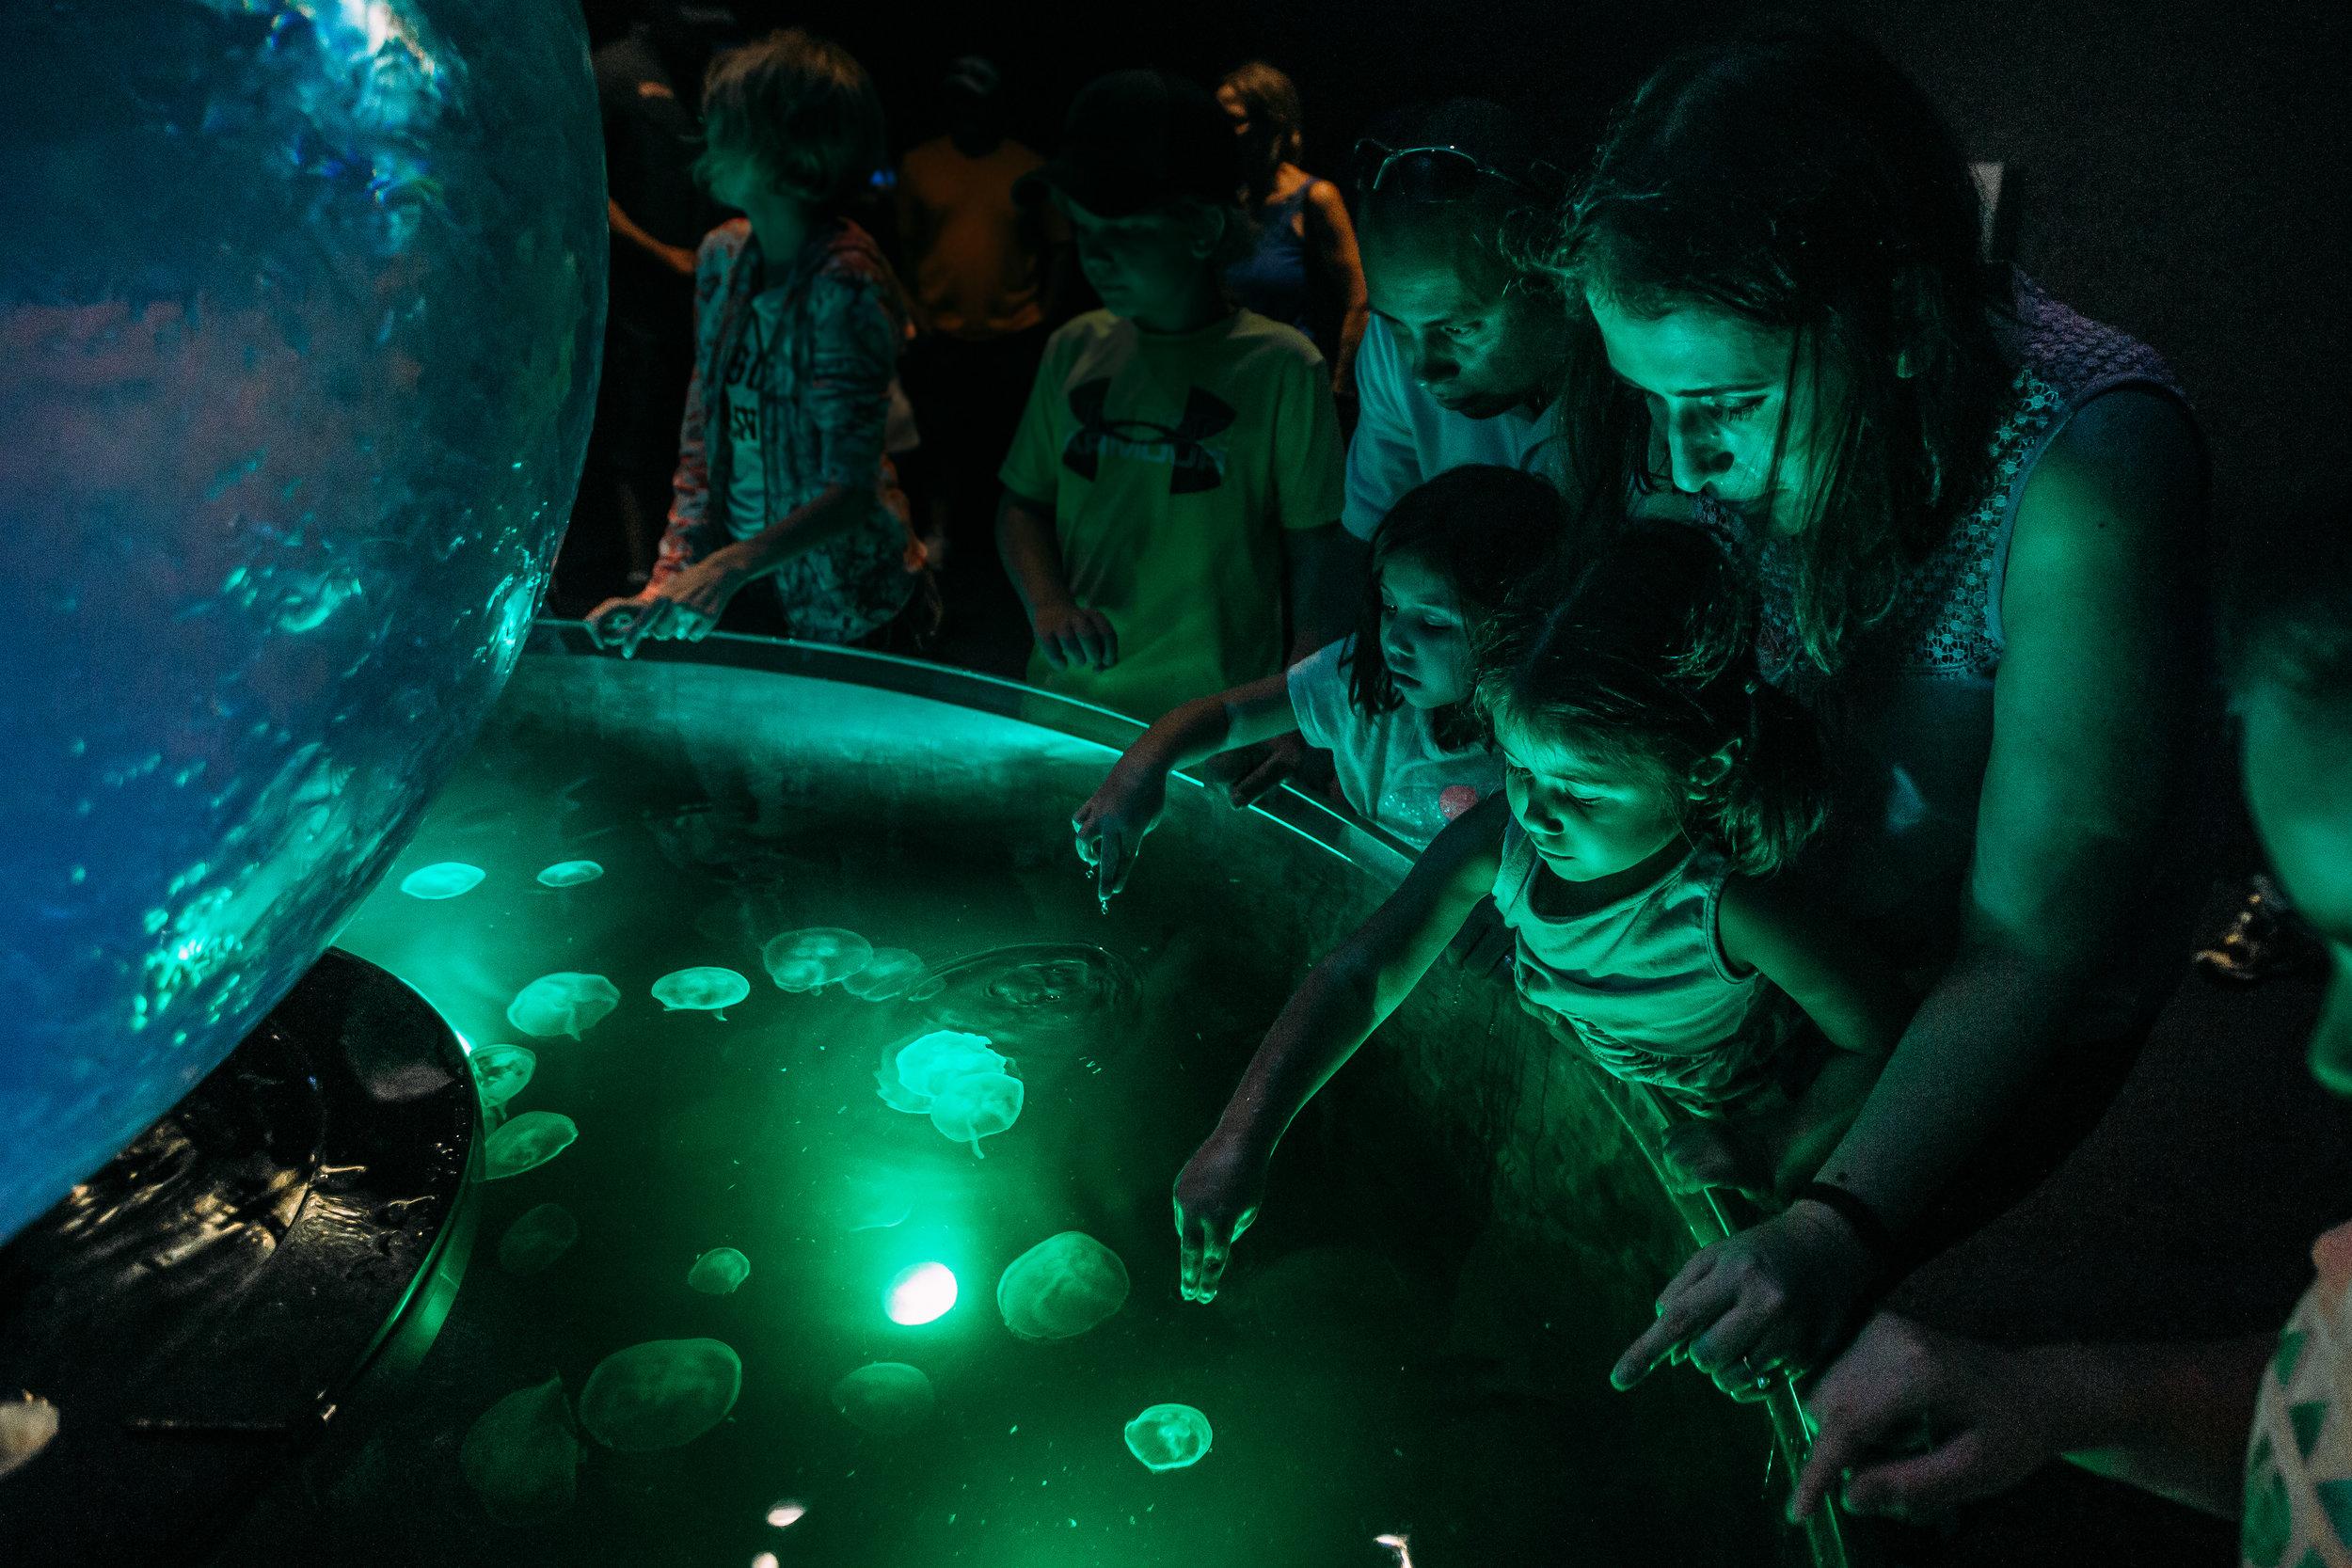 Family petting jelly fish